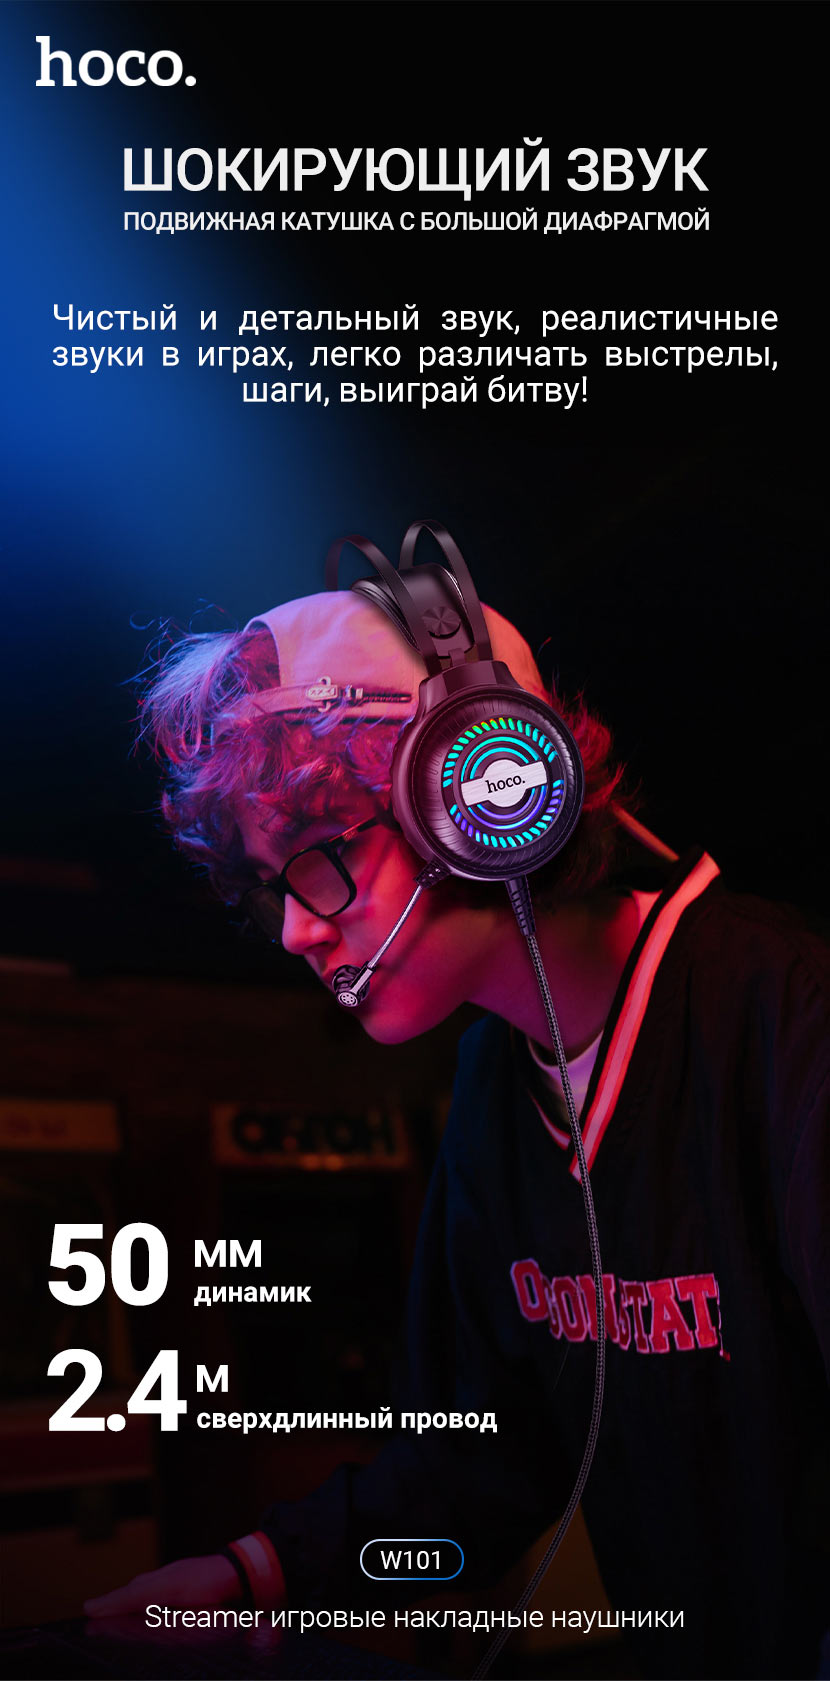 hoco news w101 streamer gaming headphones shocking ru